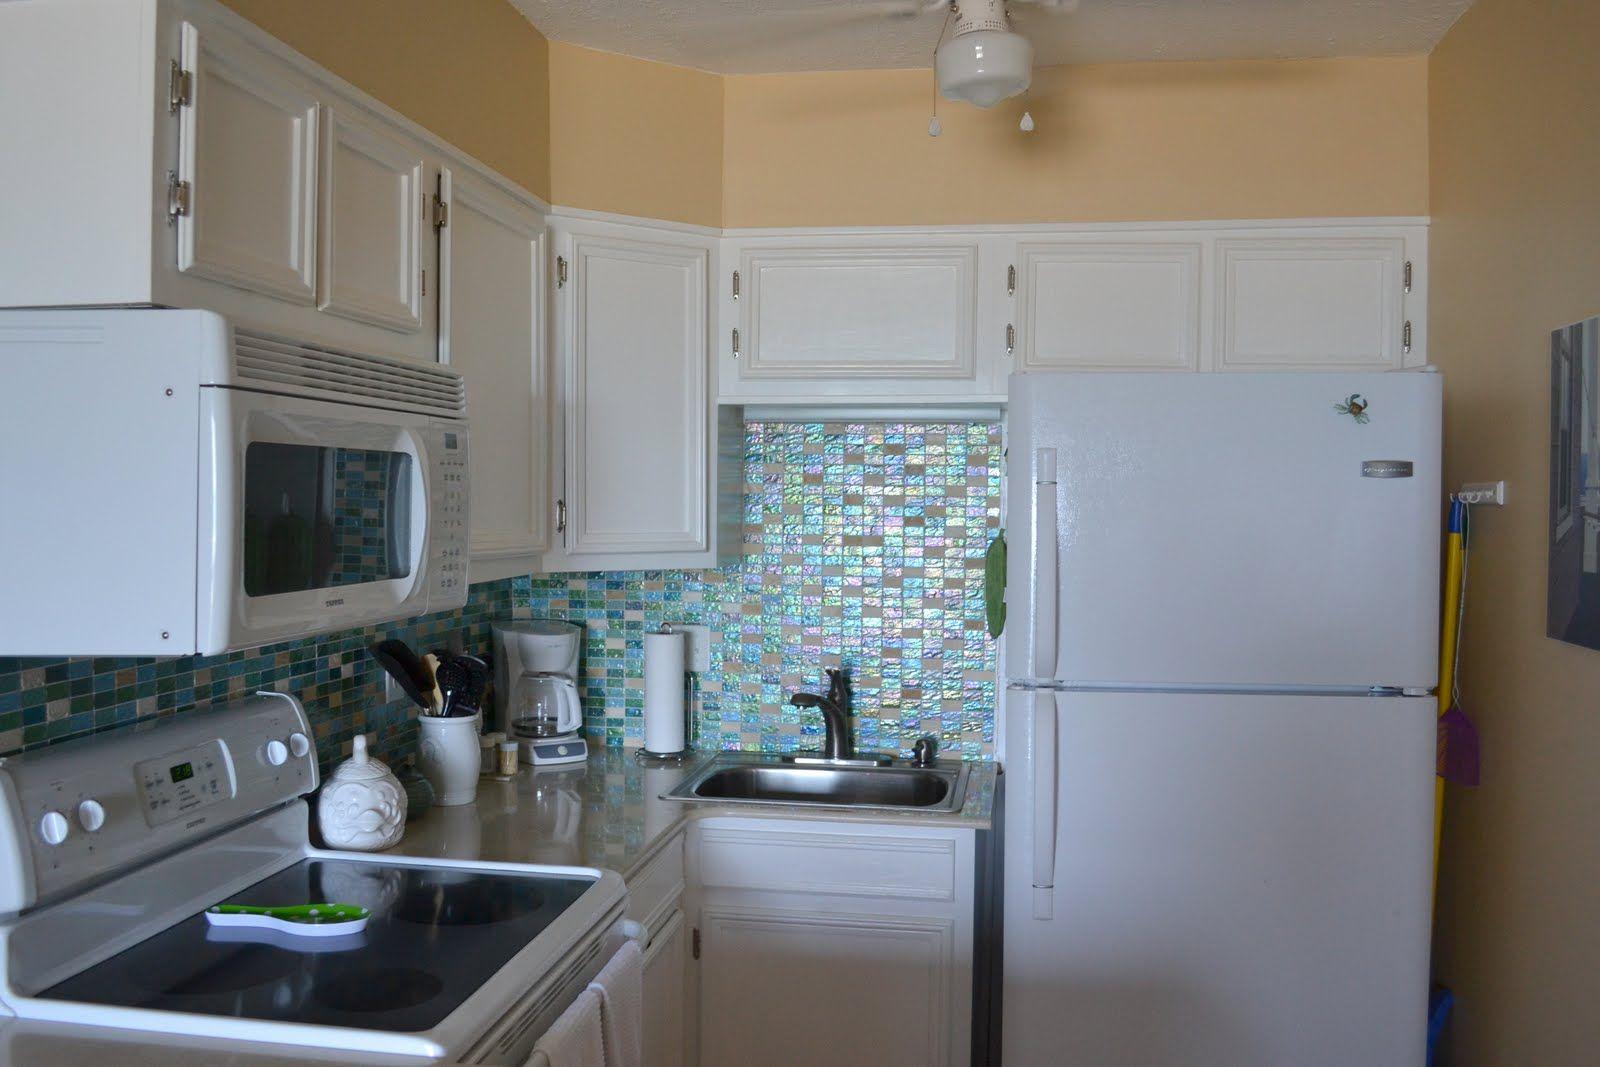 White cabinets, glass tile backsplash | Home decor | Pinterest ...